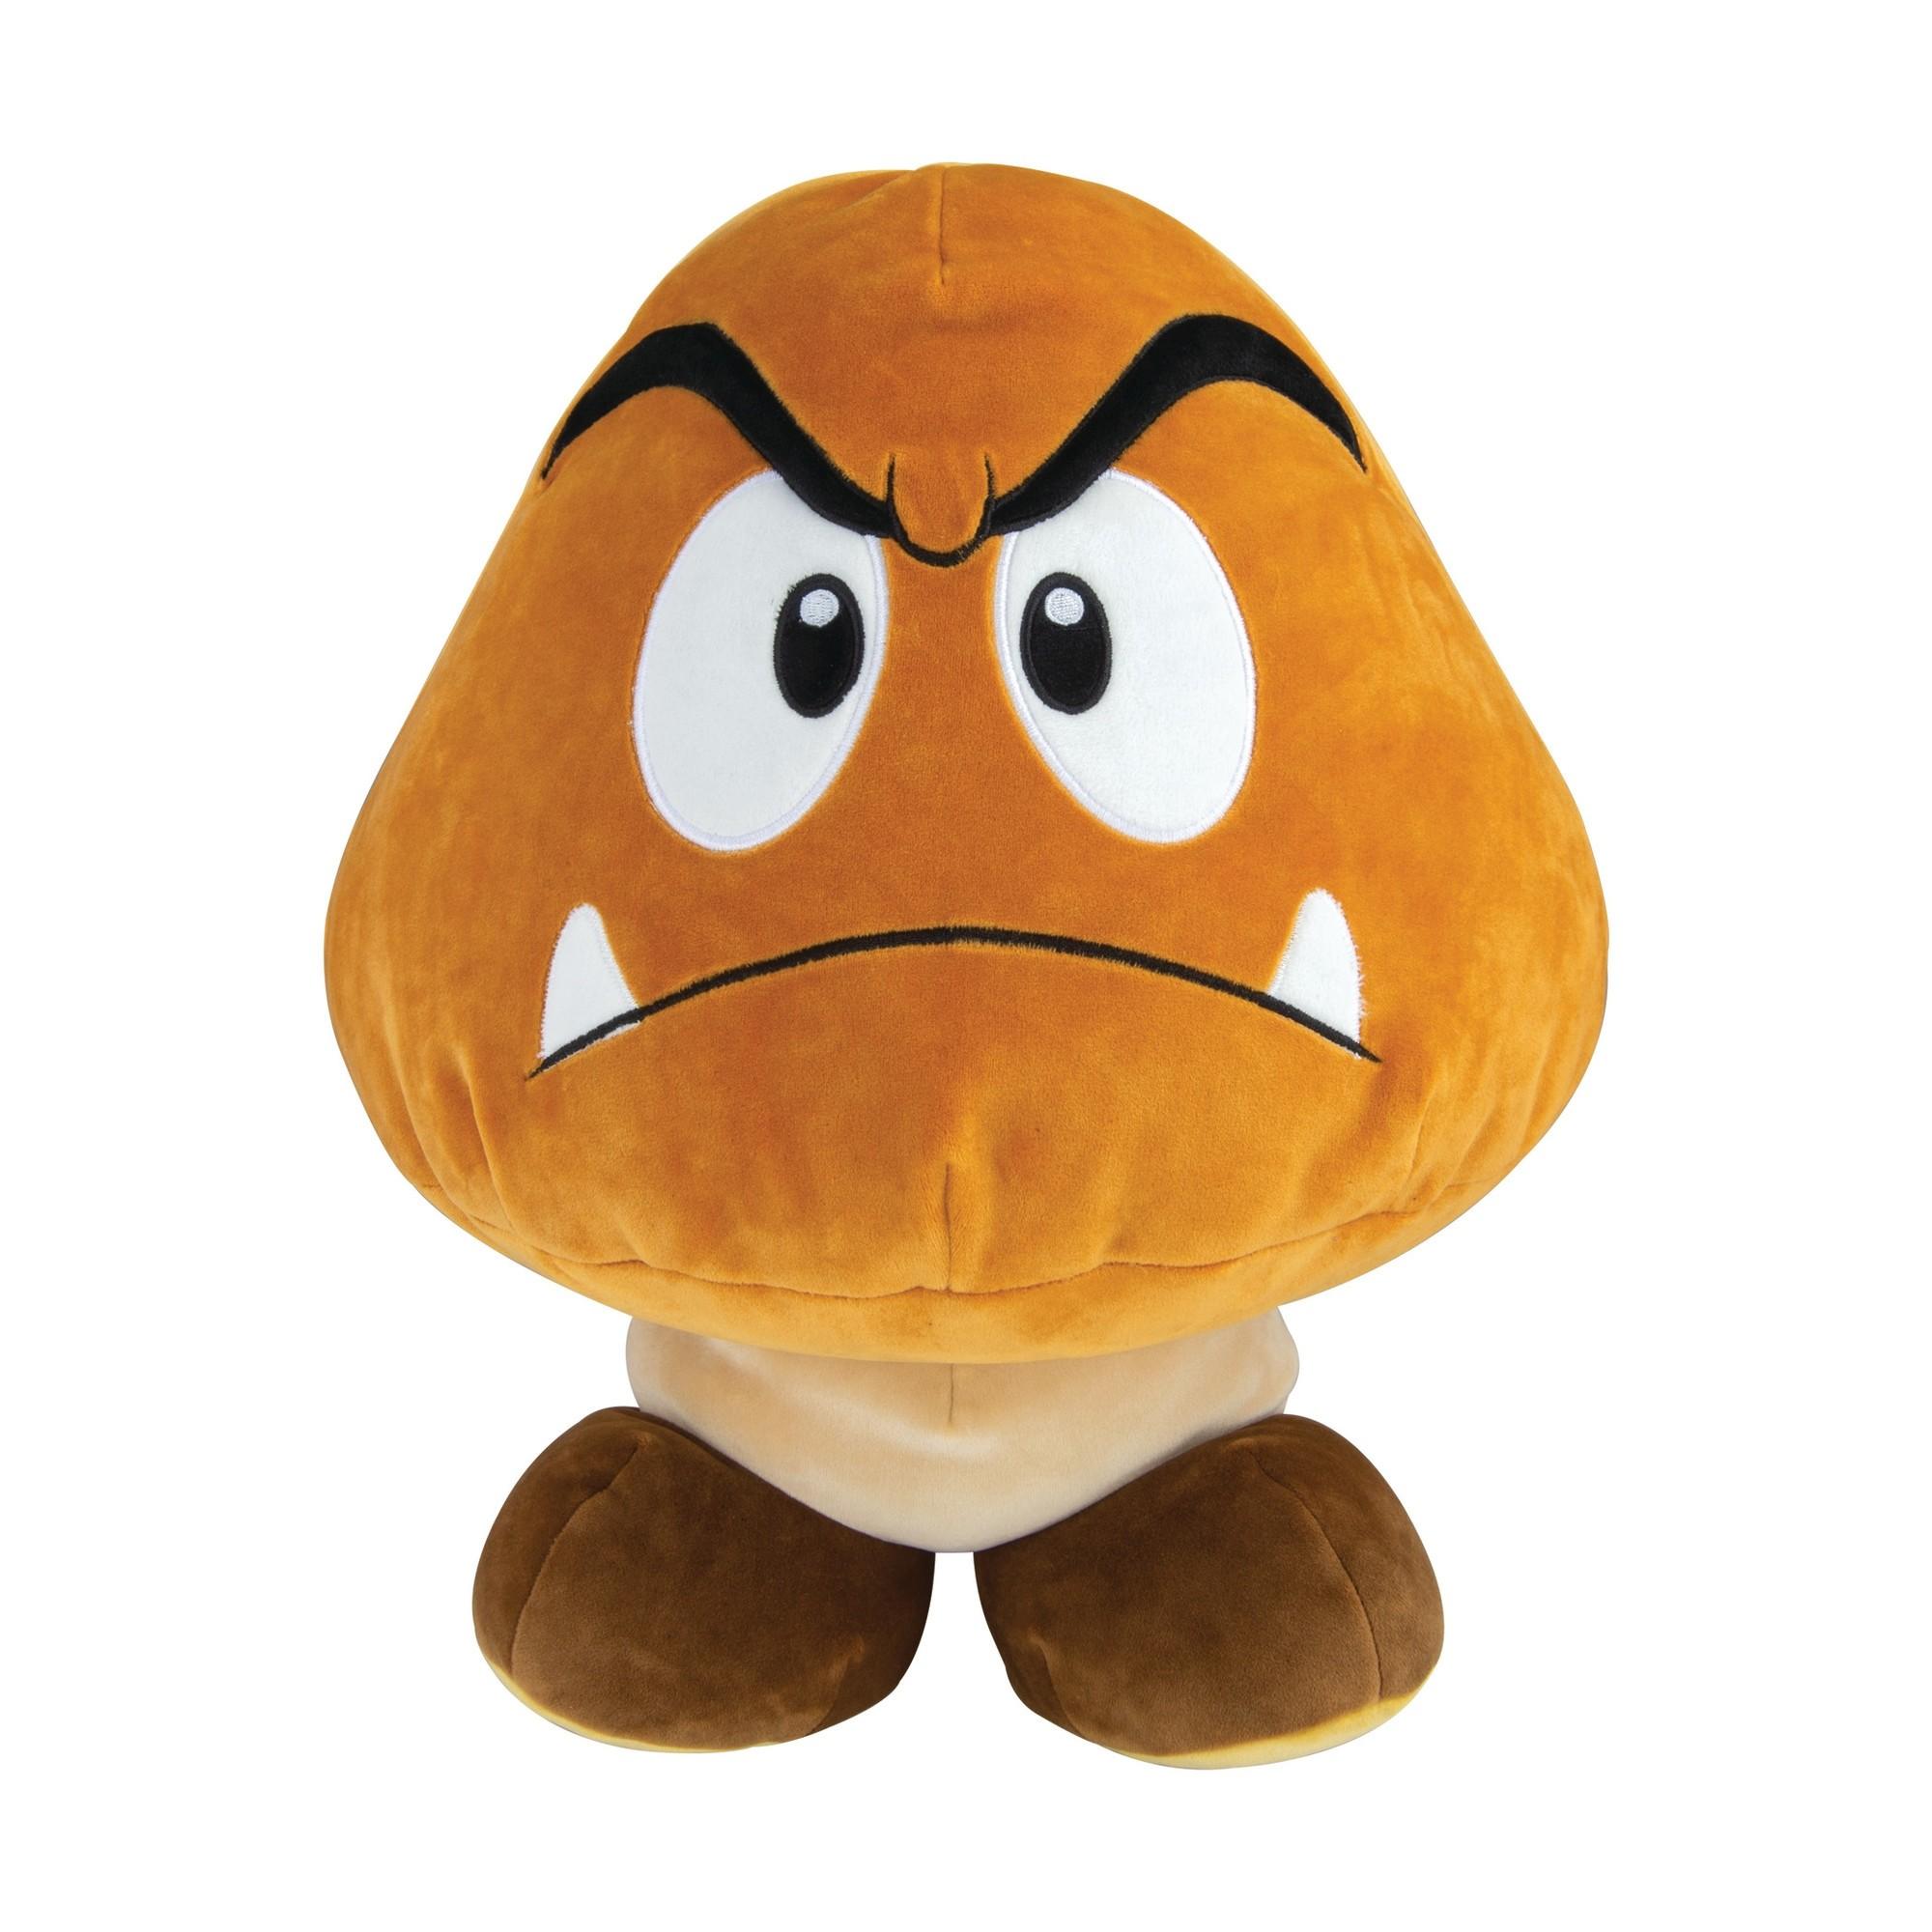 Mocchi-Mocchi Super Mario Bros Goomba Mega Plush